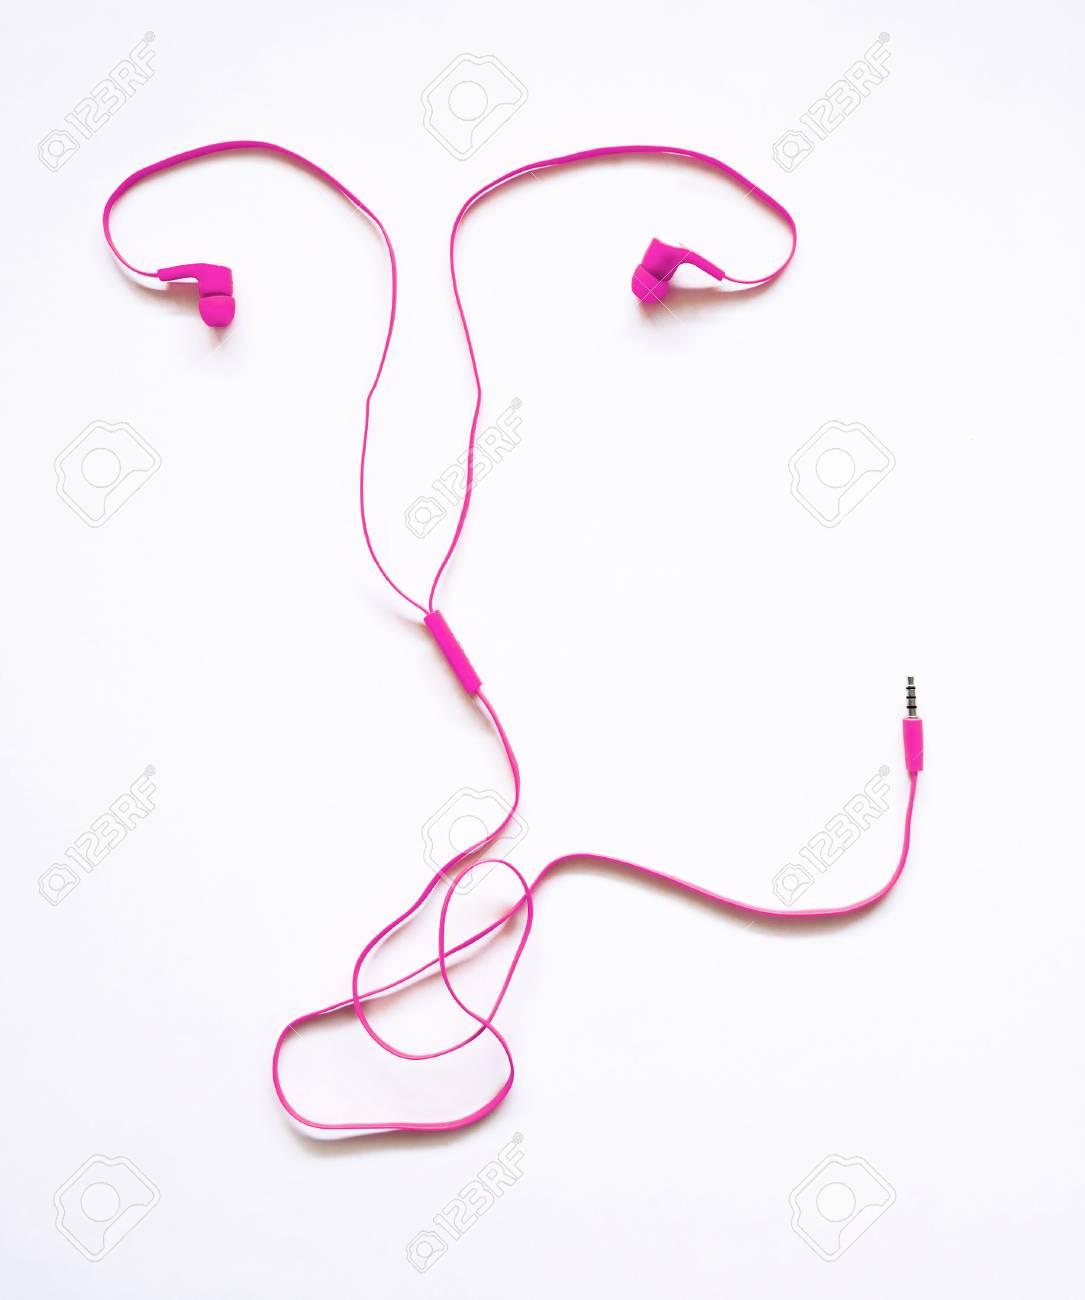 1085x1300 Headphones Earphones Pink Uterus Shape On White Background. Listen